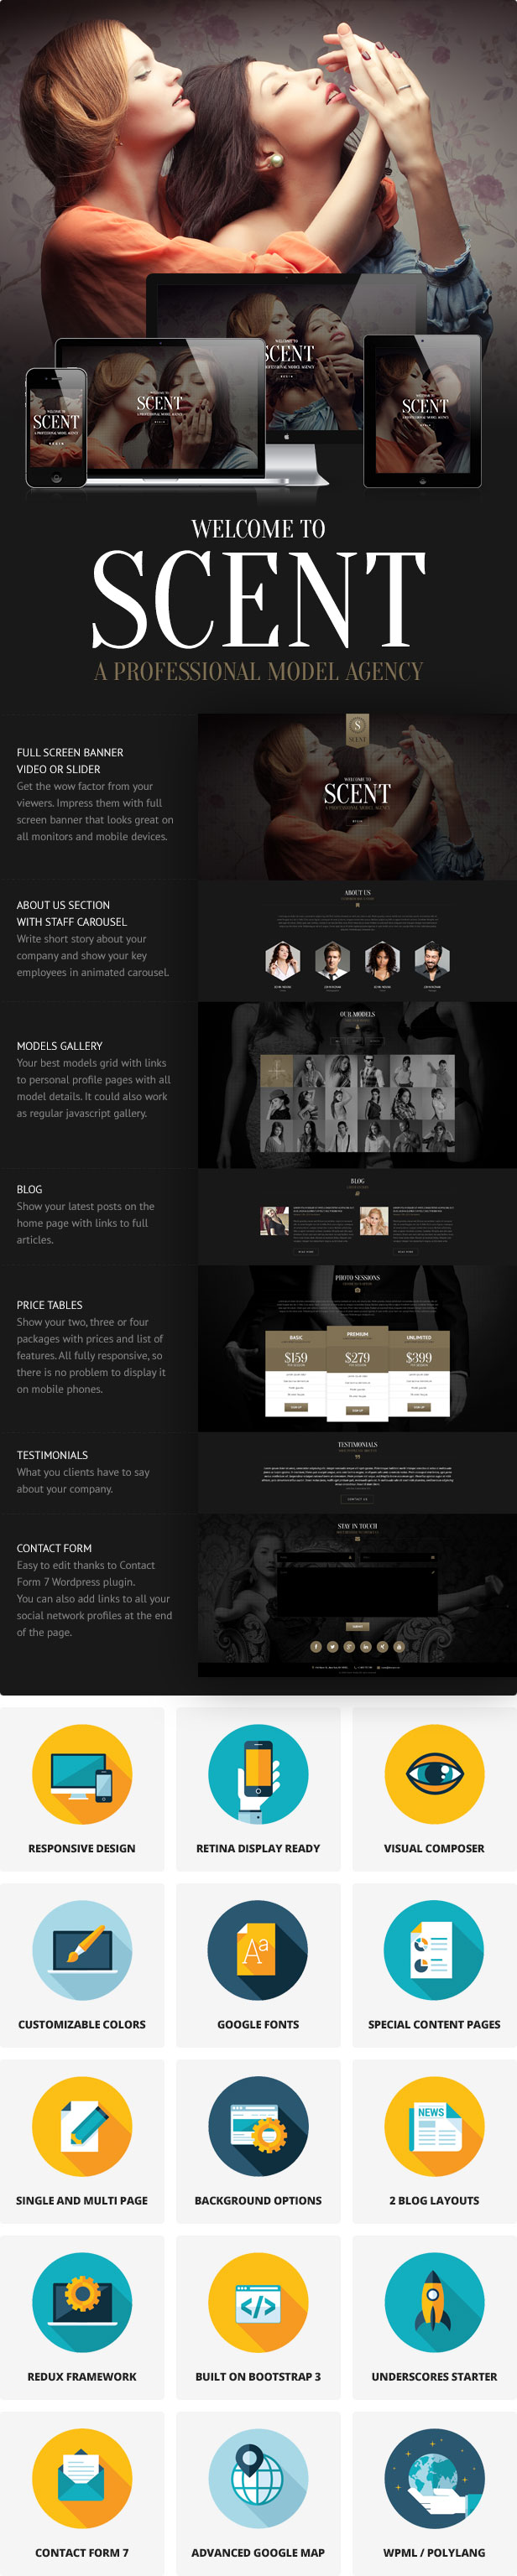 Scent - Model Agency WordPress Theme - 1